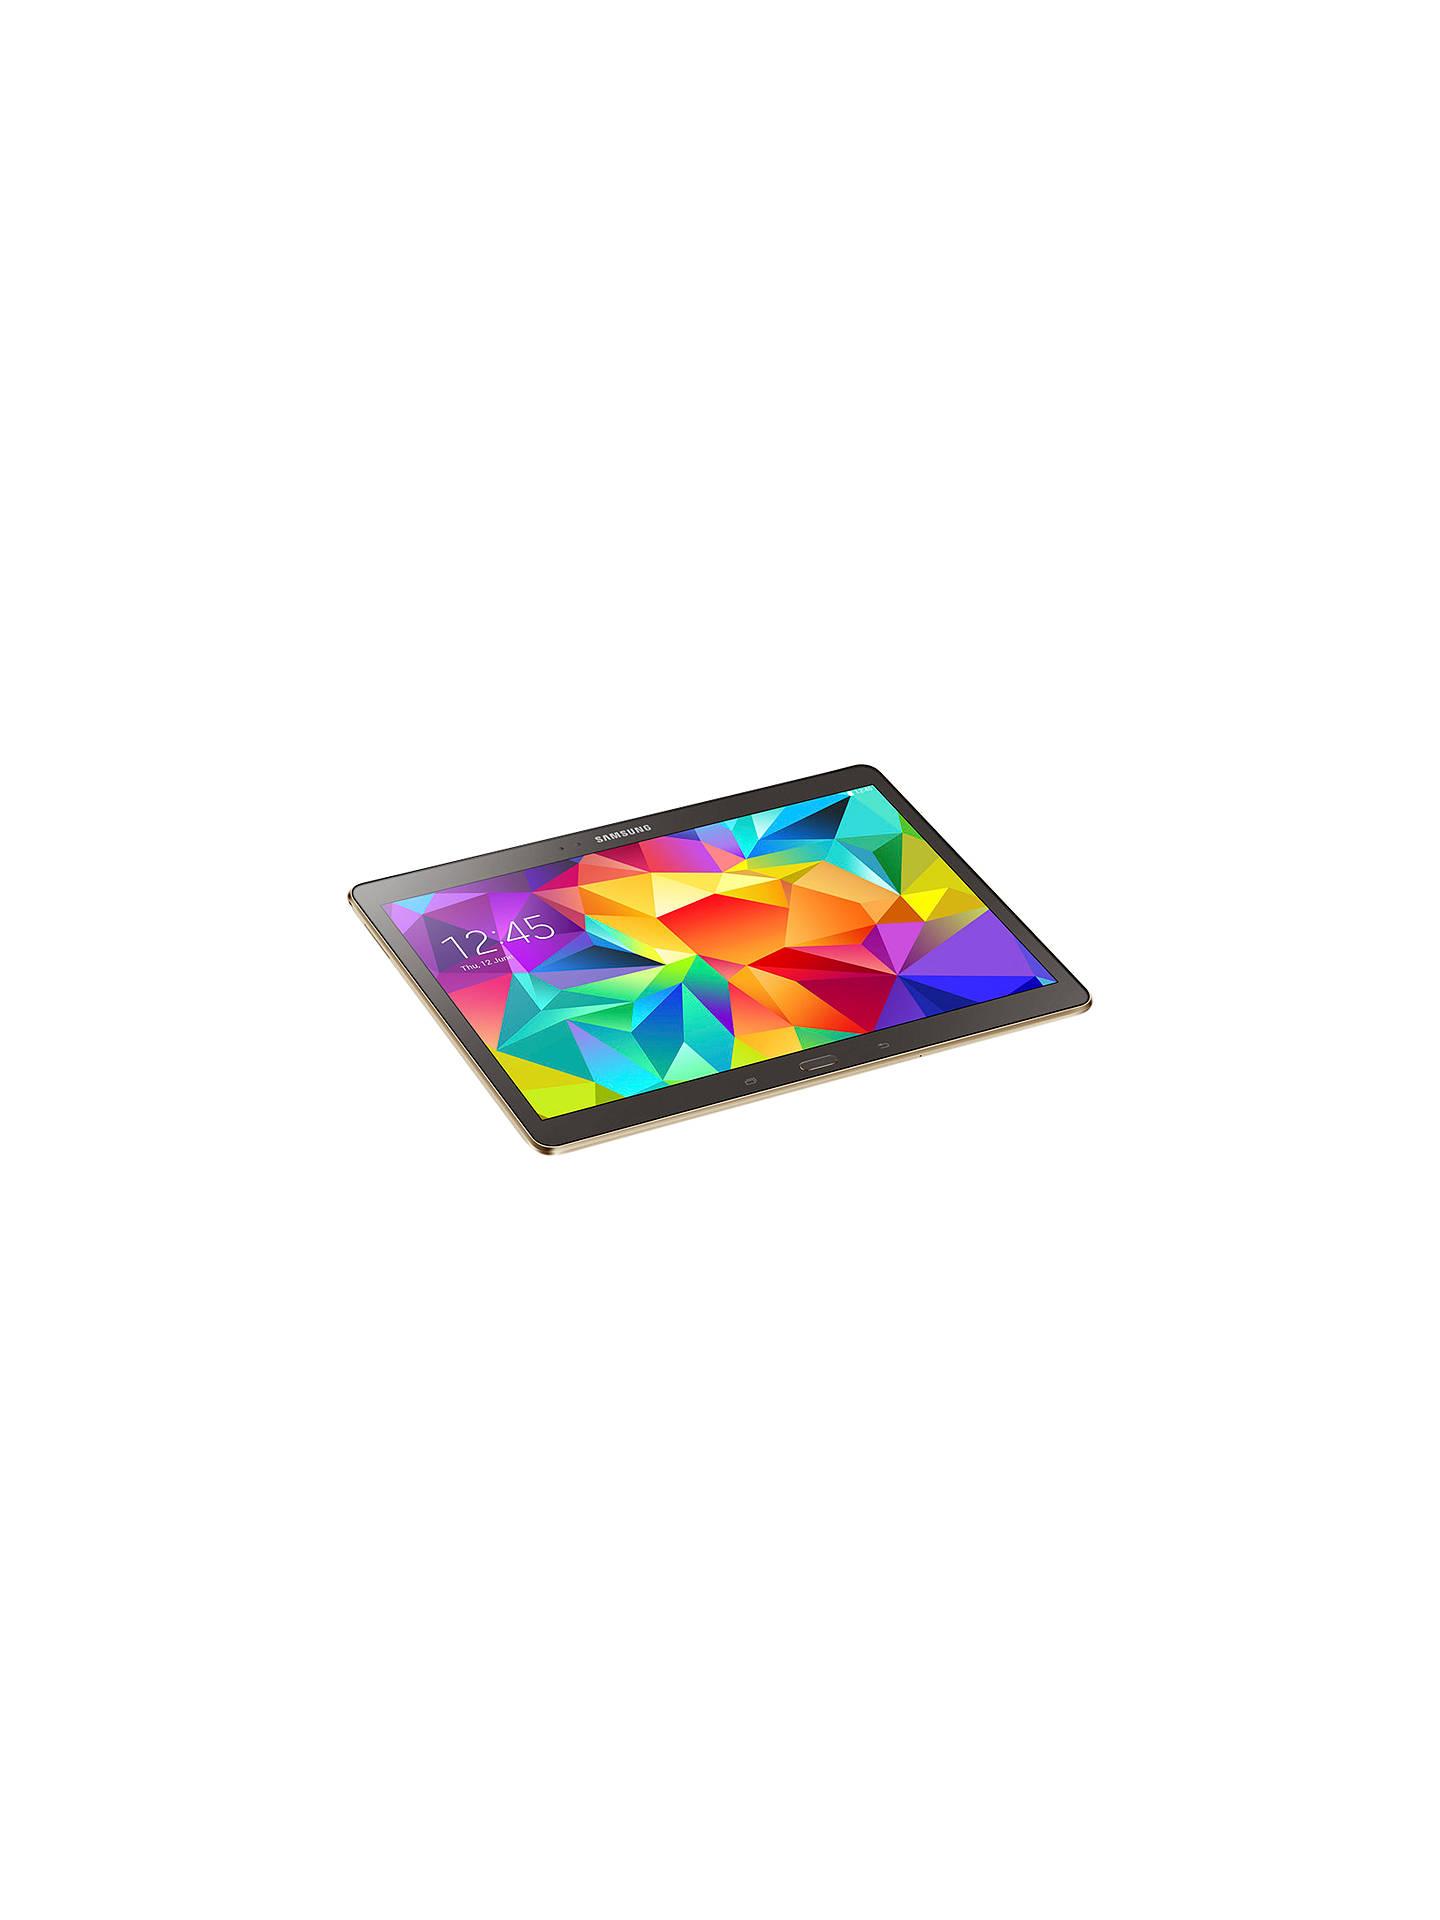 Samsung Galaxy Tab S 10 5 Tablet, Octa-Core Samsung Exynos